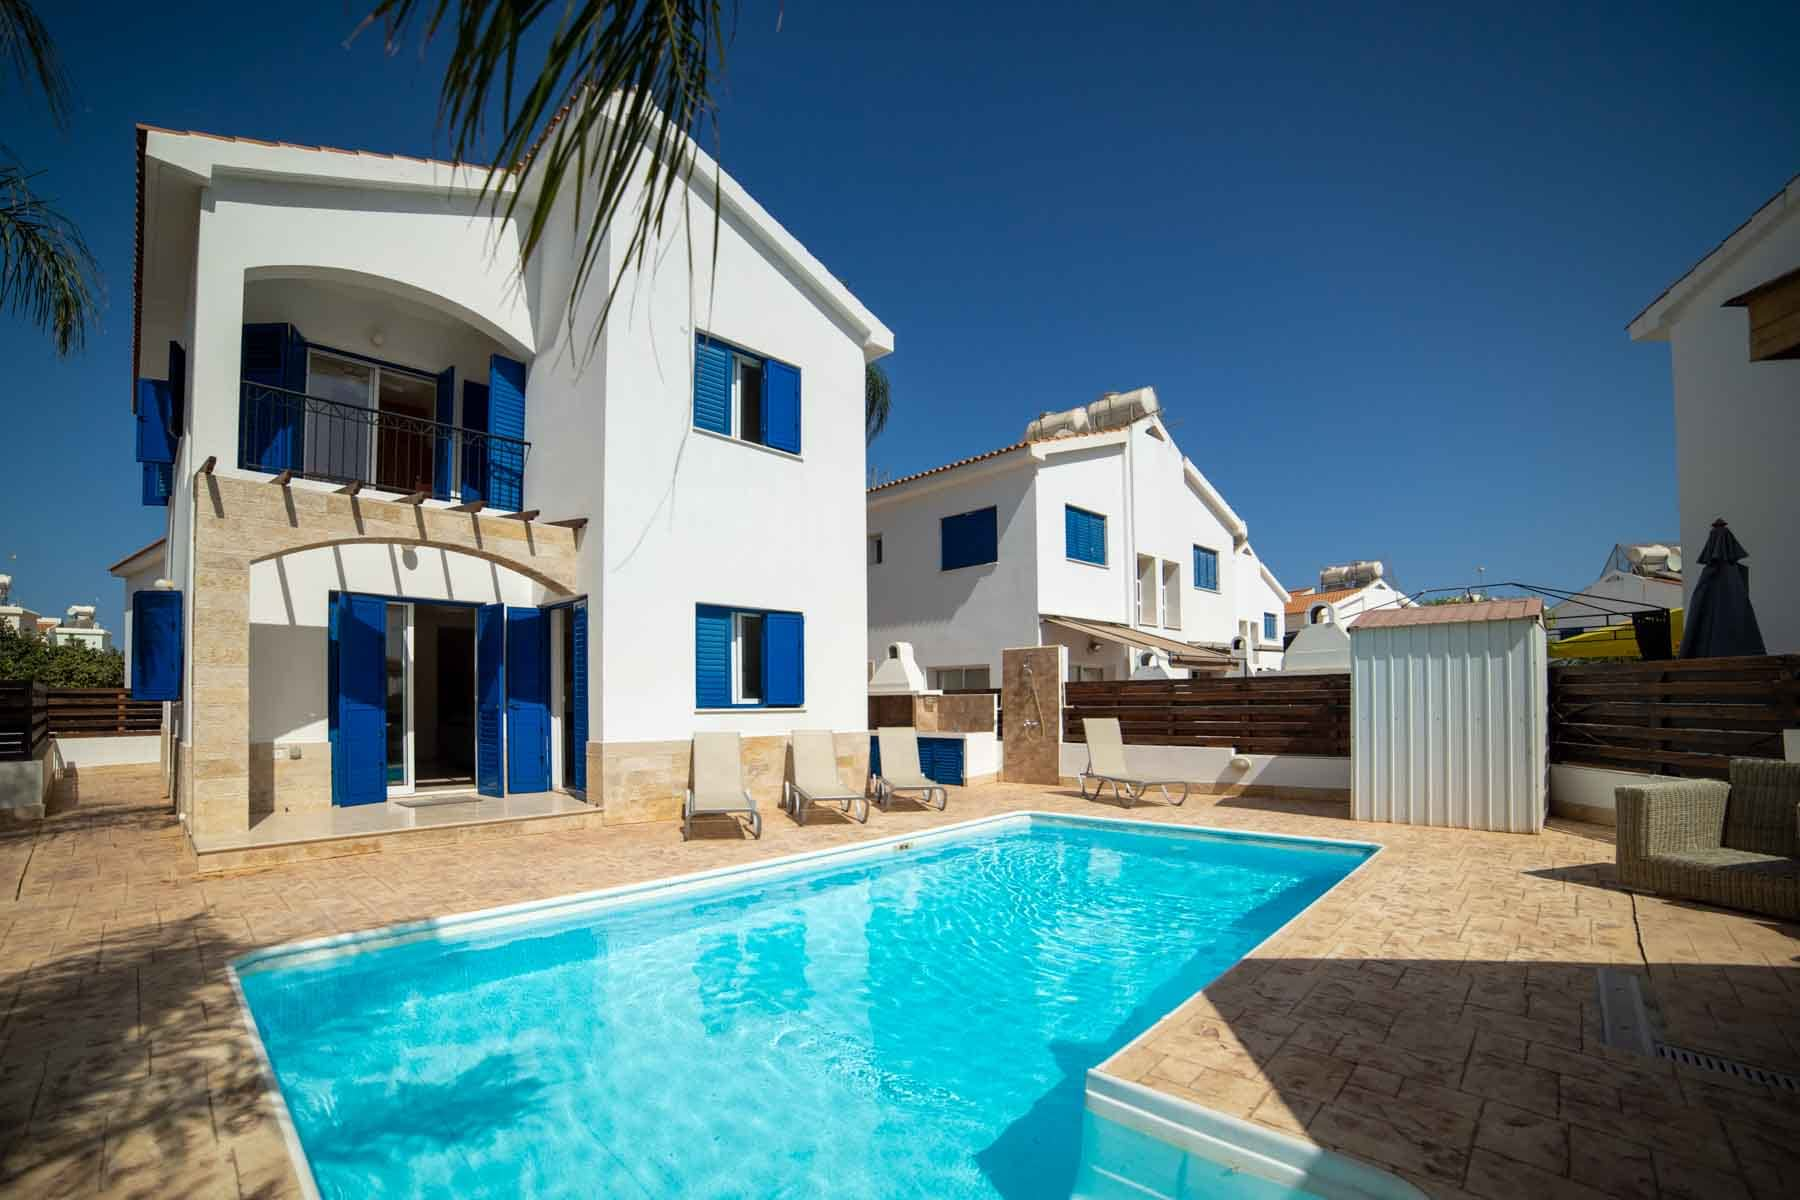 Three Bedroom Detached Villa in Ayia Triada